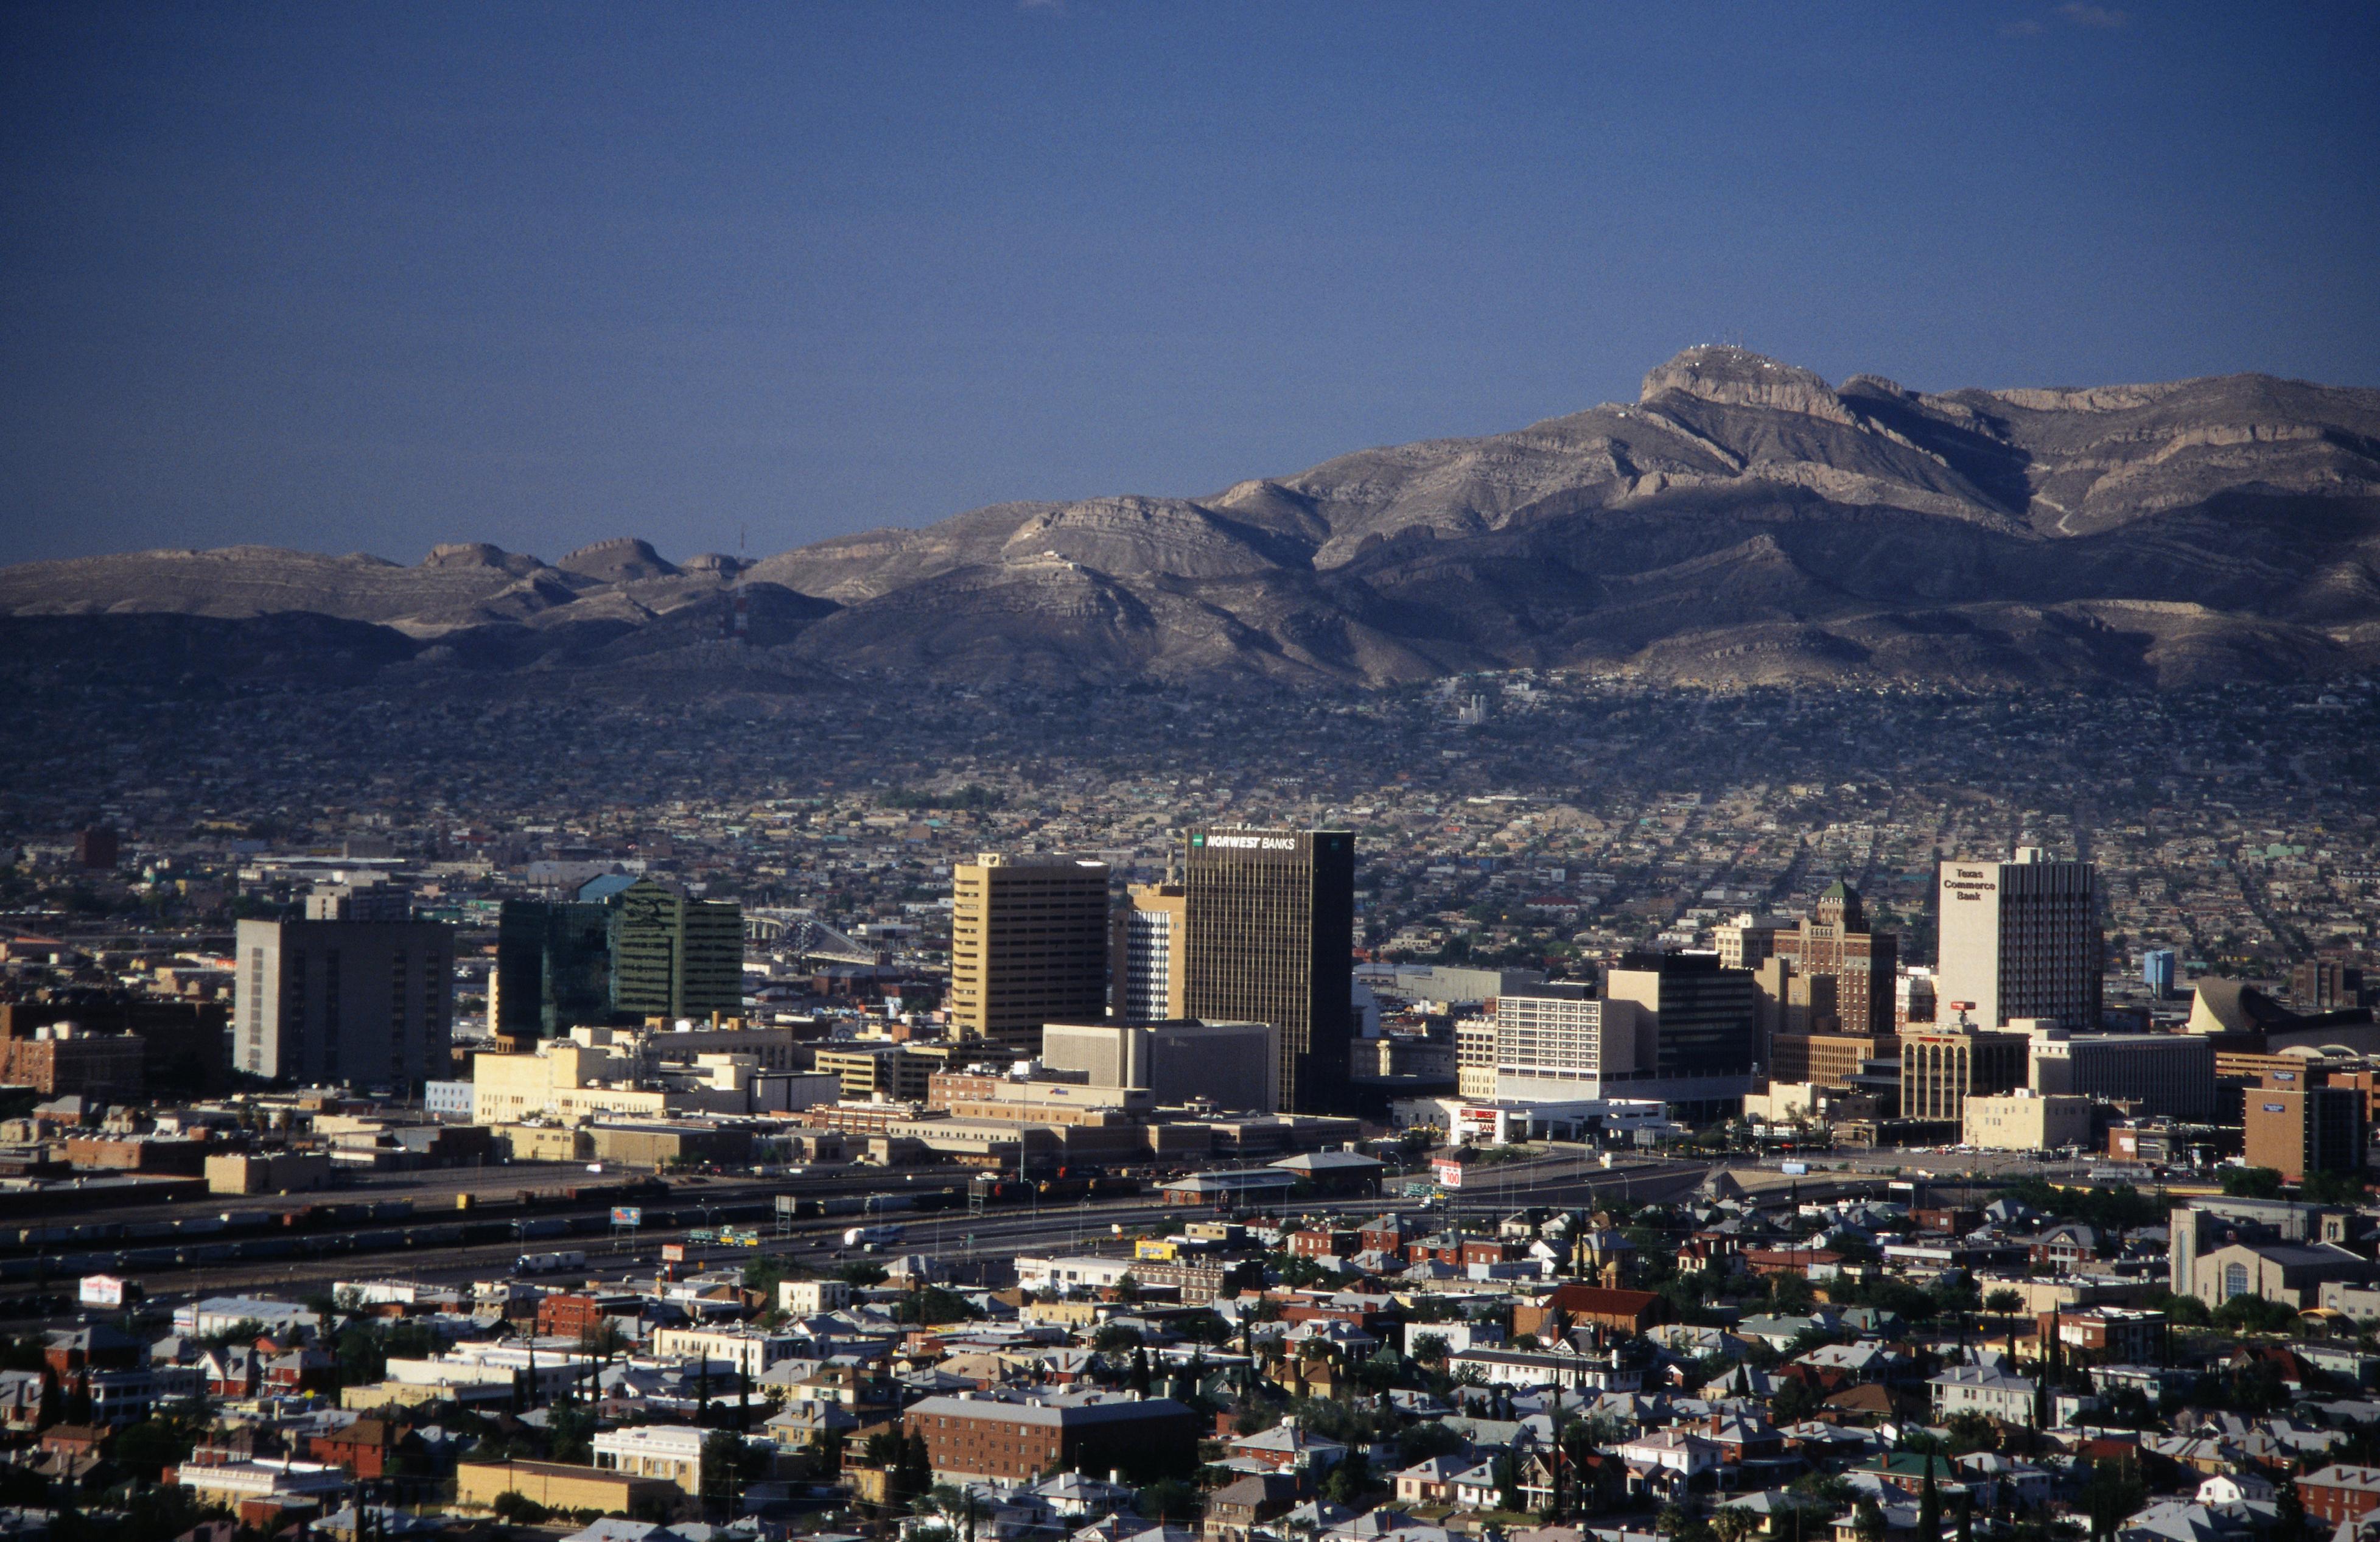 Ciudad Juarez, aerial view